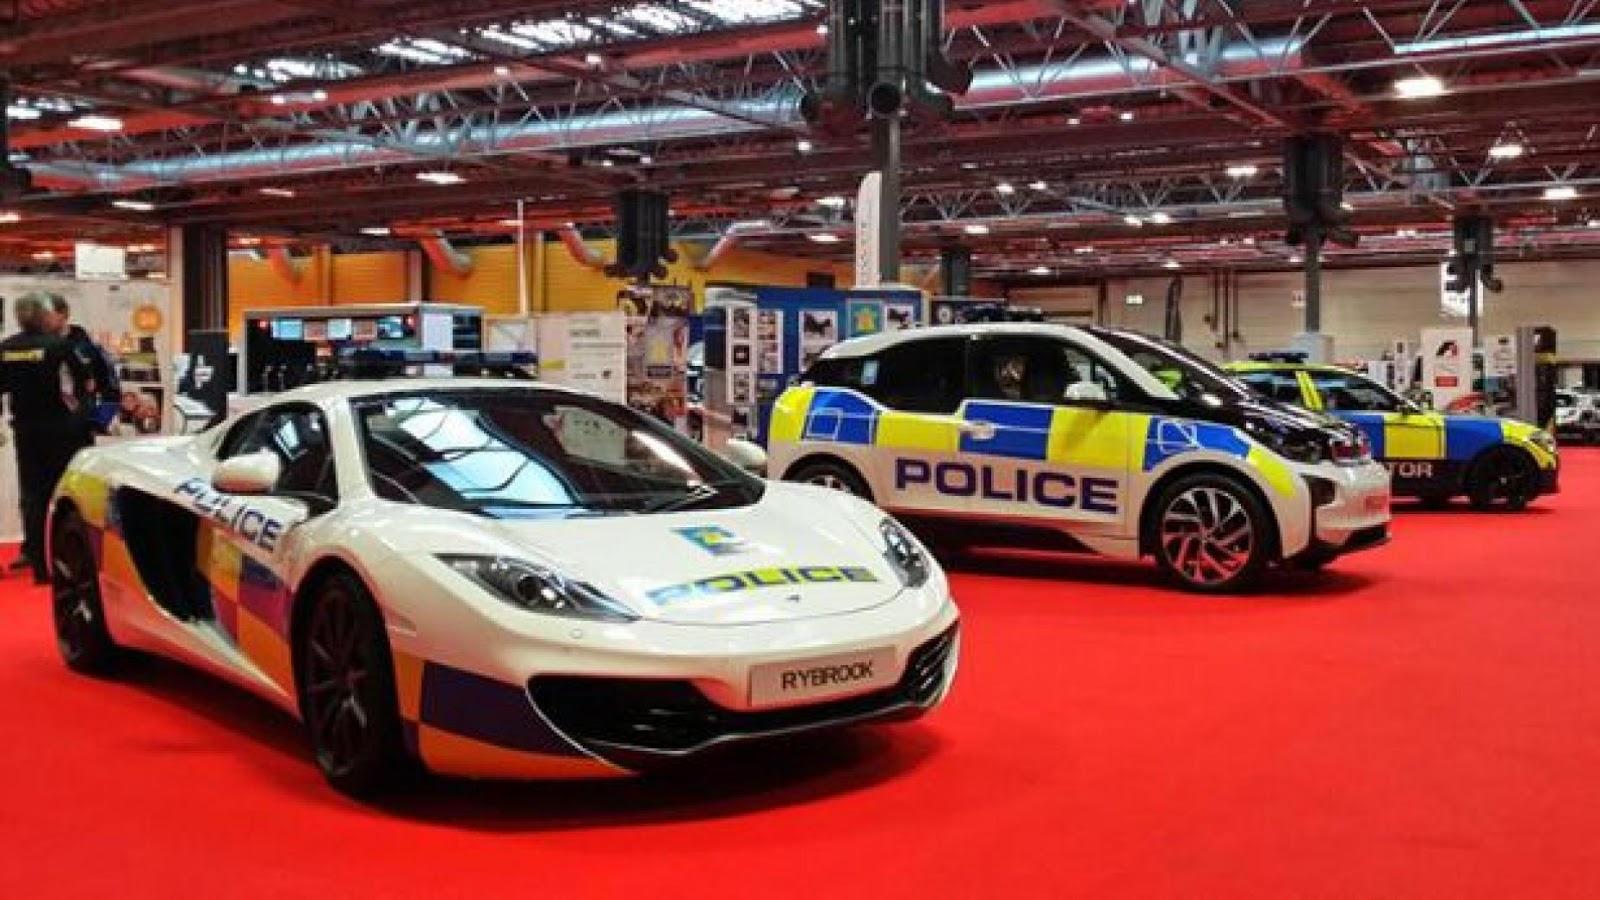 UK police McLaren 12C